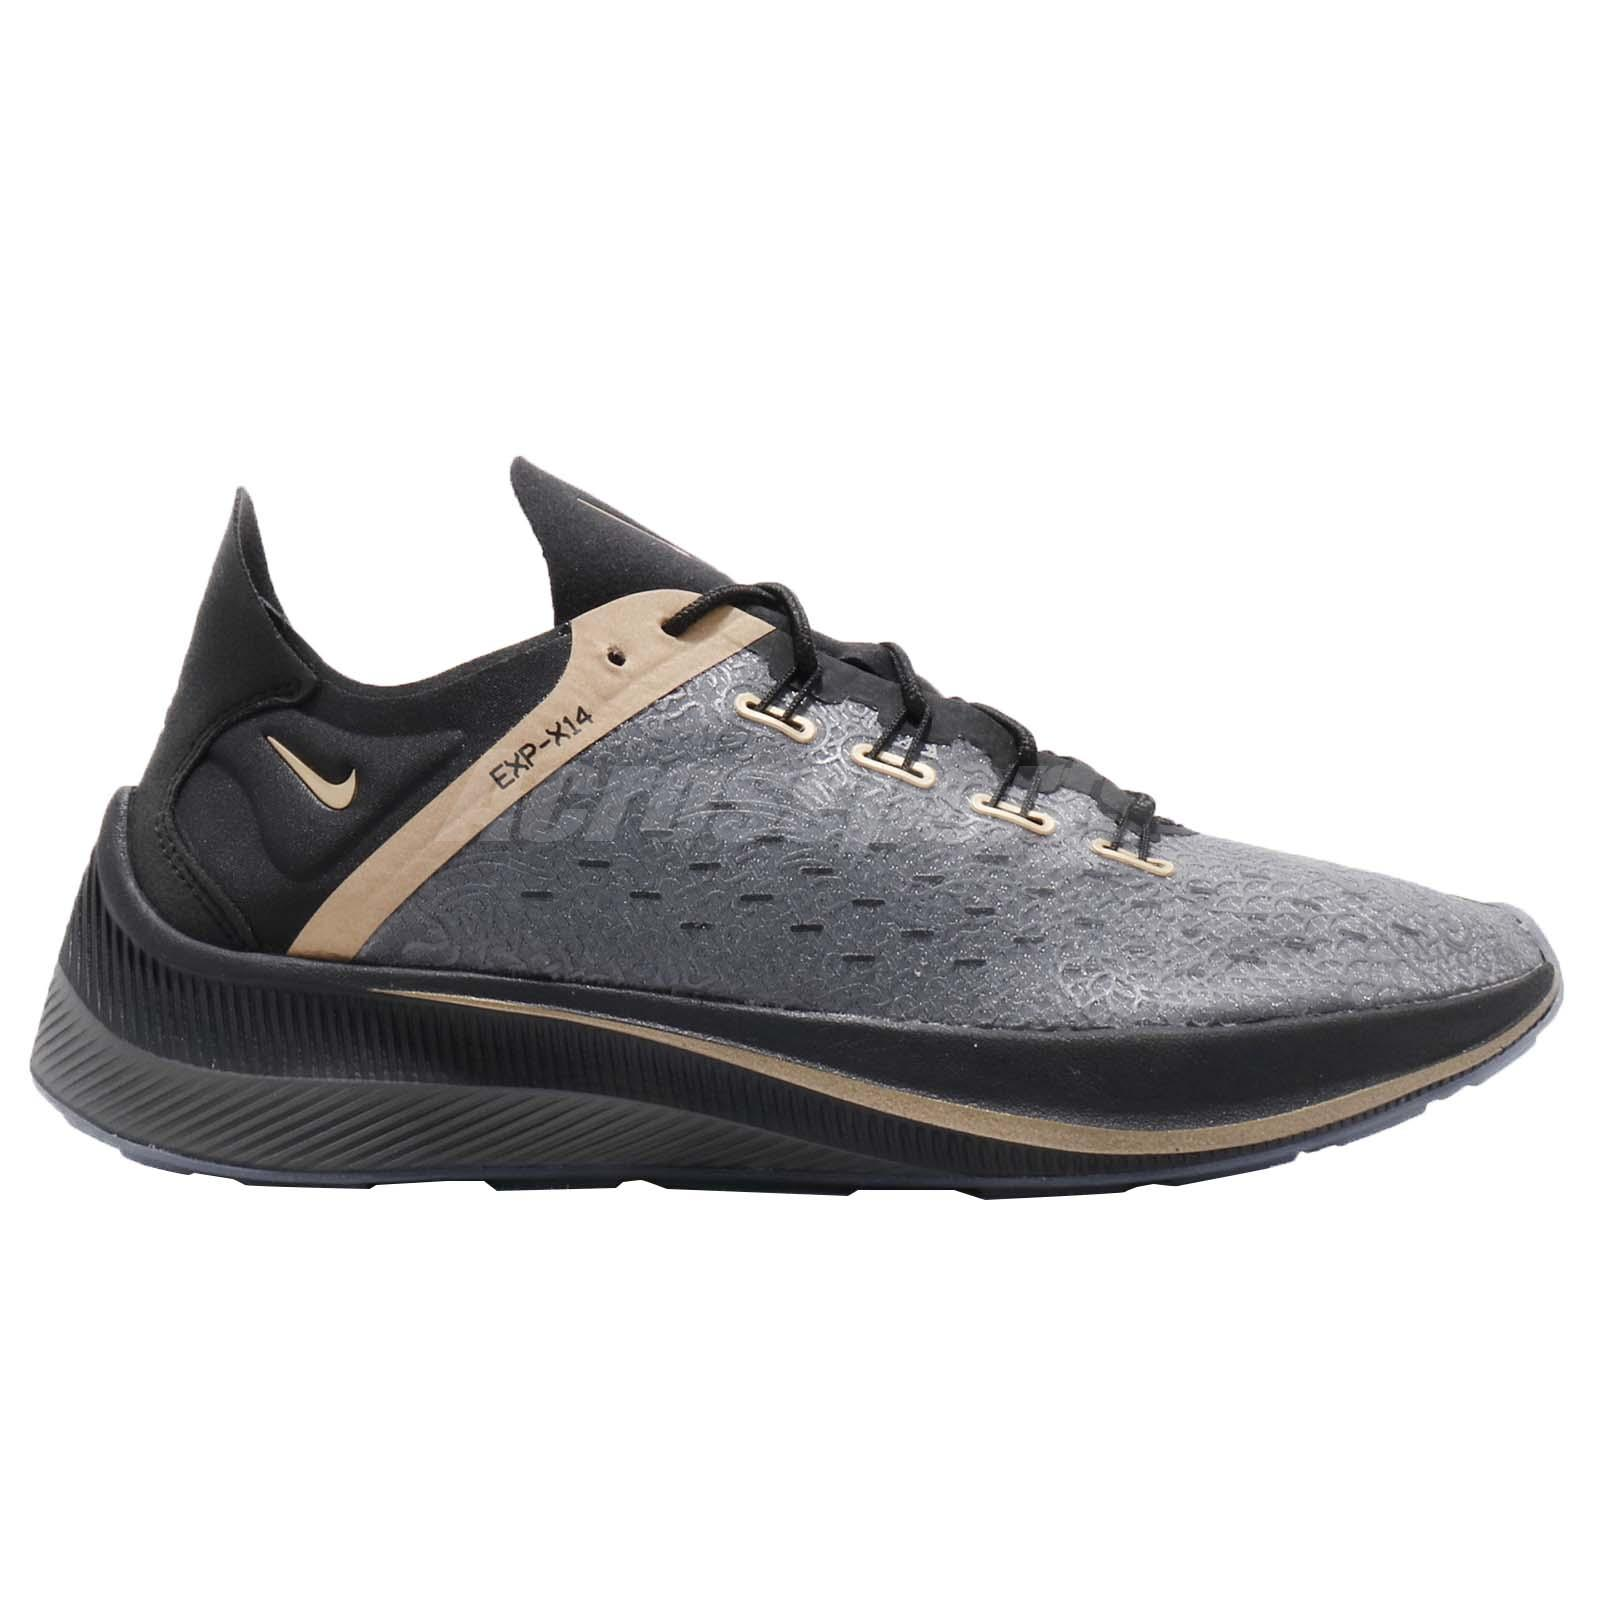 the best attitude c21b6 a2ae0 Nike EXP-X14 CR7 Cristiano Ronaldo Black Gold Men Running Shoes ...